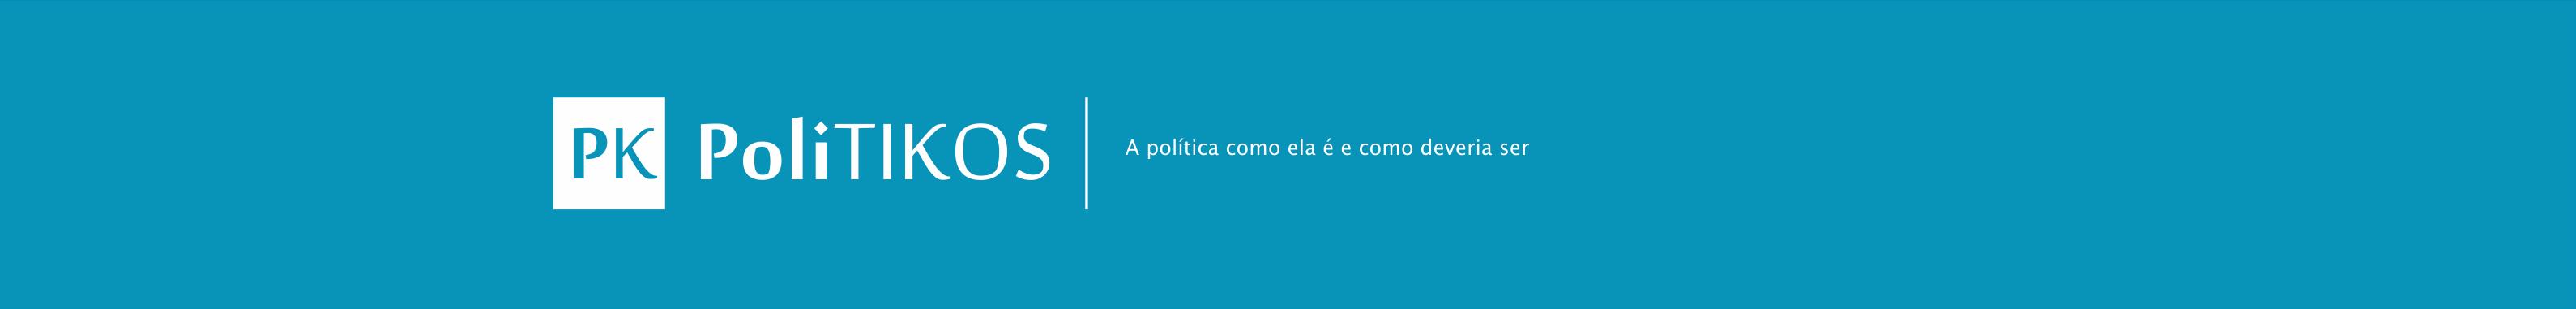 Politikos